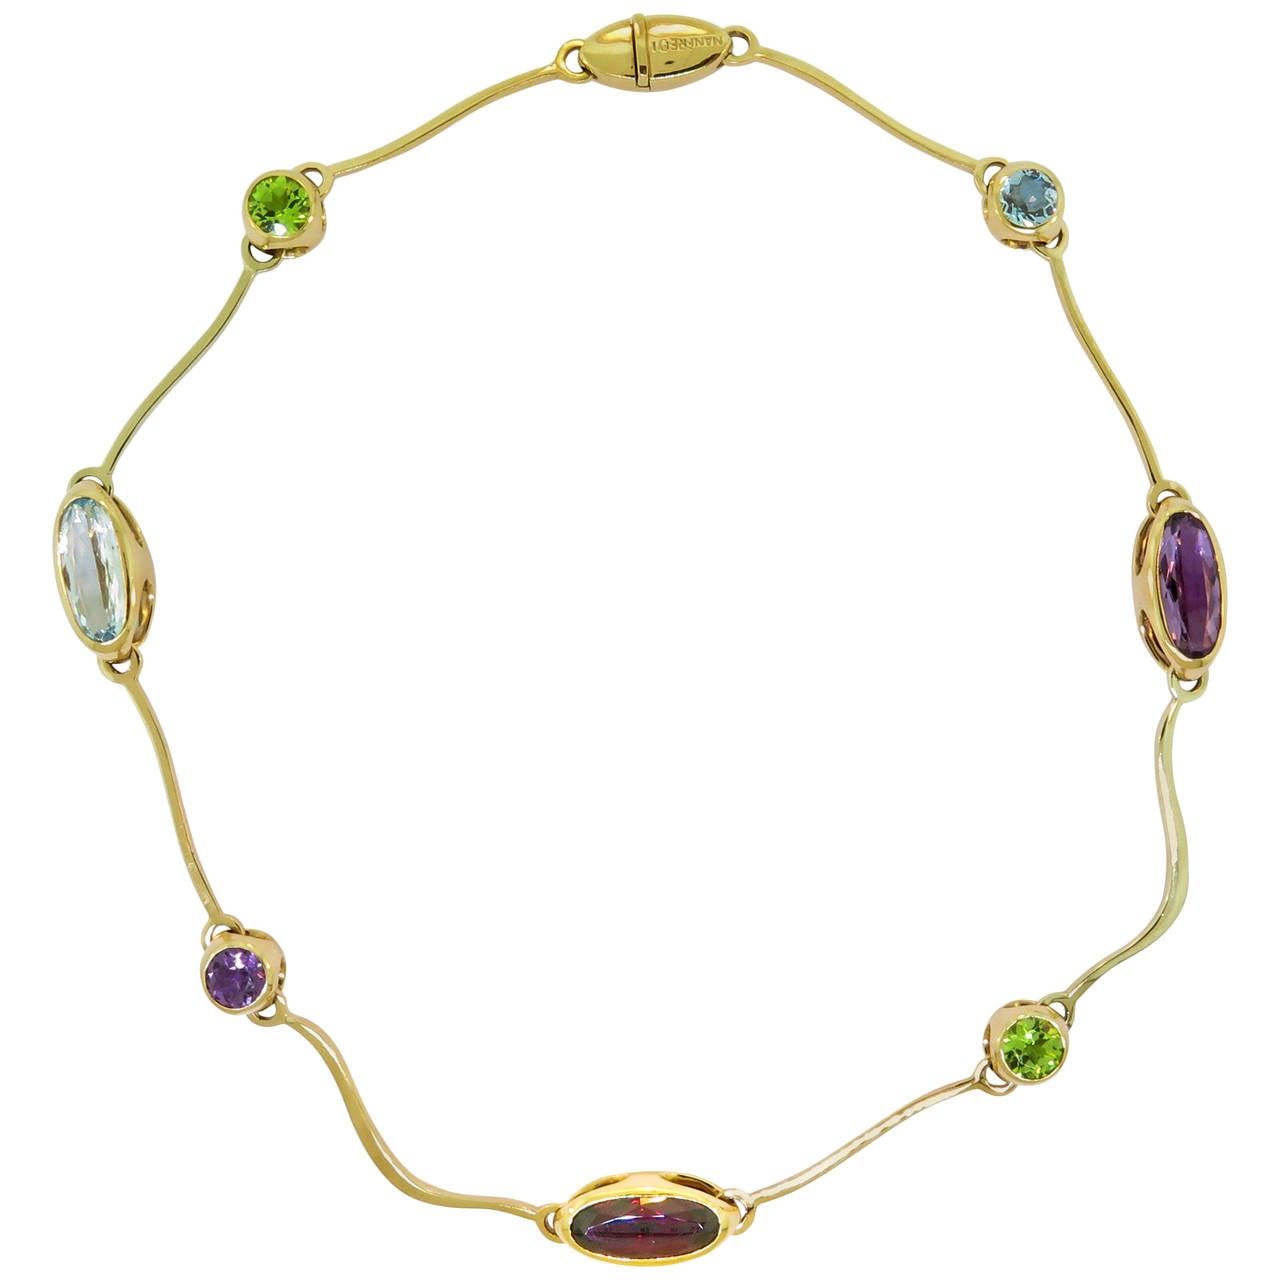 Multi Gemstones Arabesco Yellow Gold Necklace by Manfredi